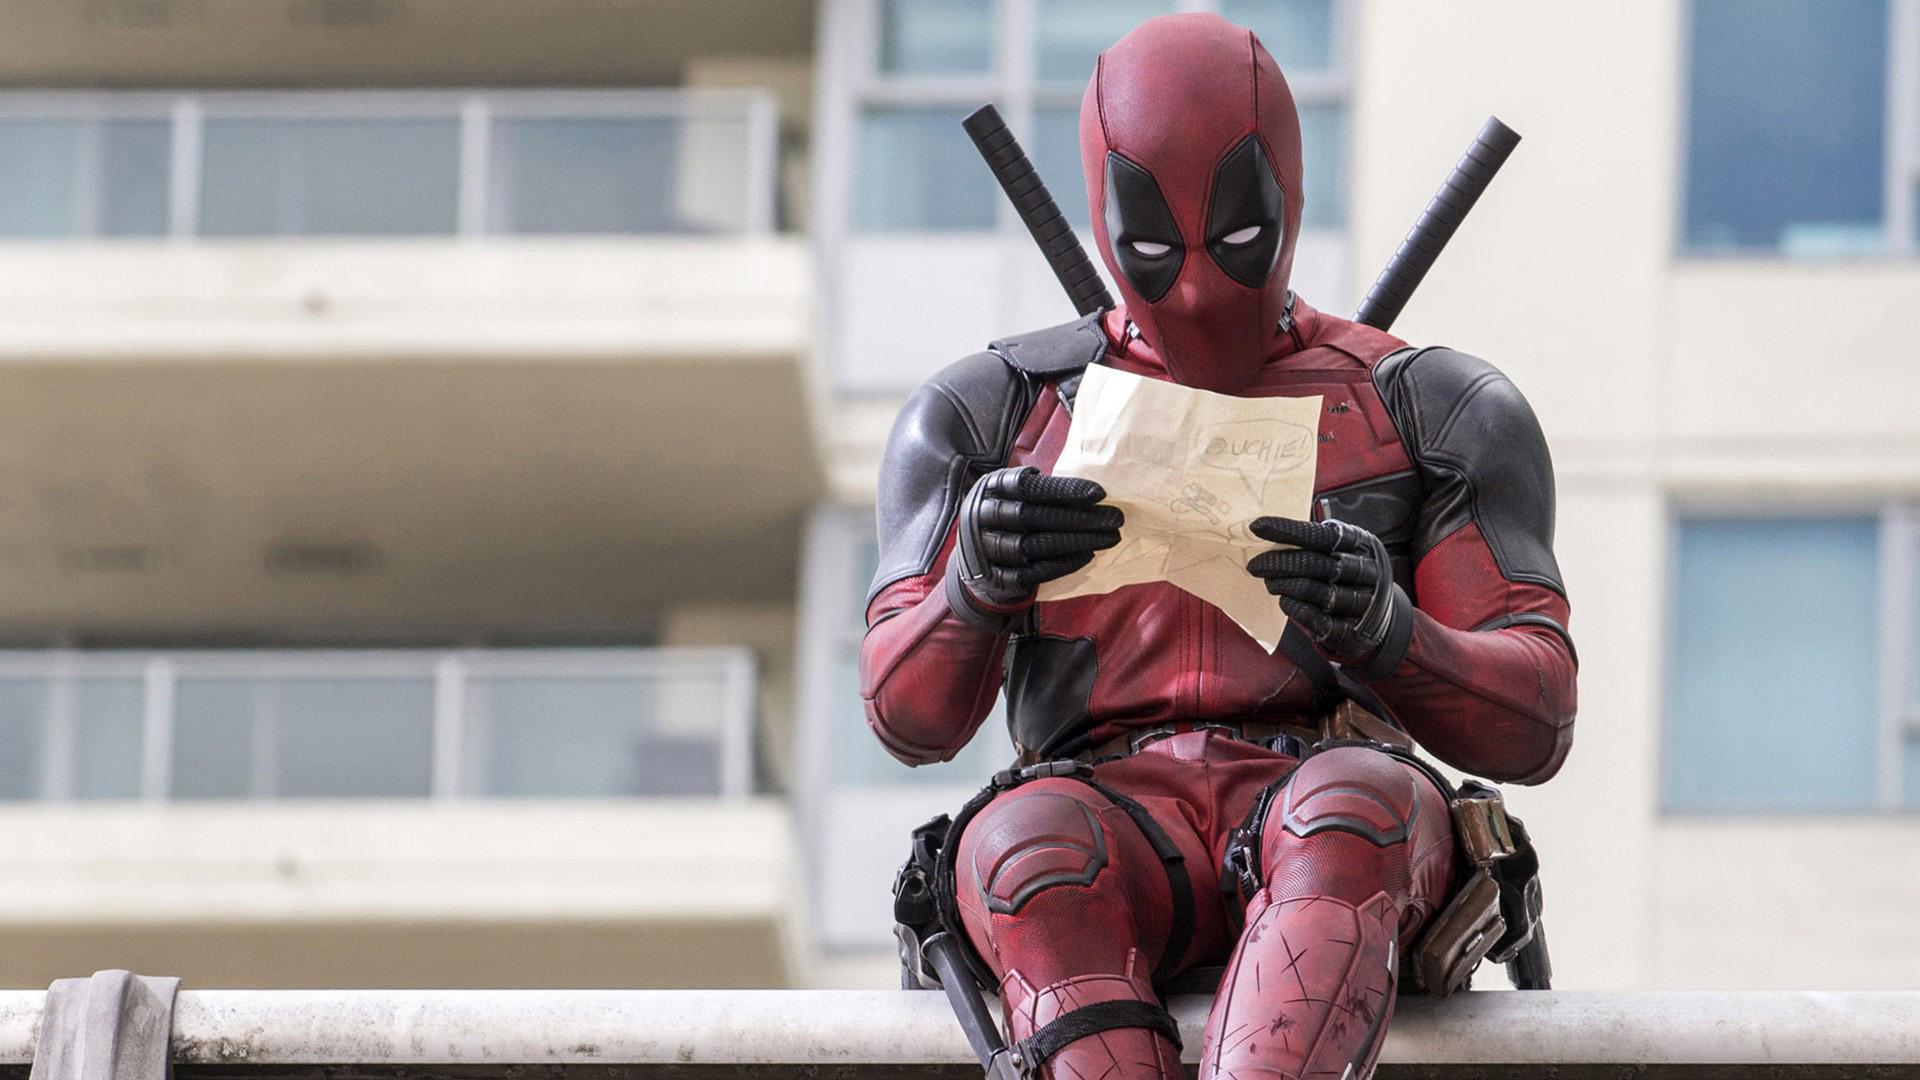 Deadpool Reading Screenshot Movie 2016 Wallpaper HD 1920x1080